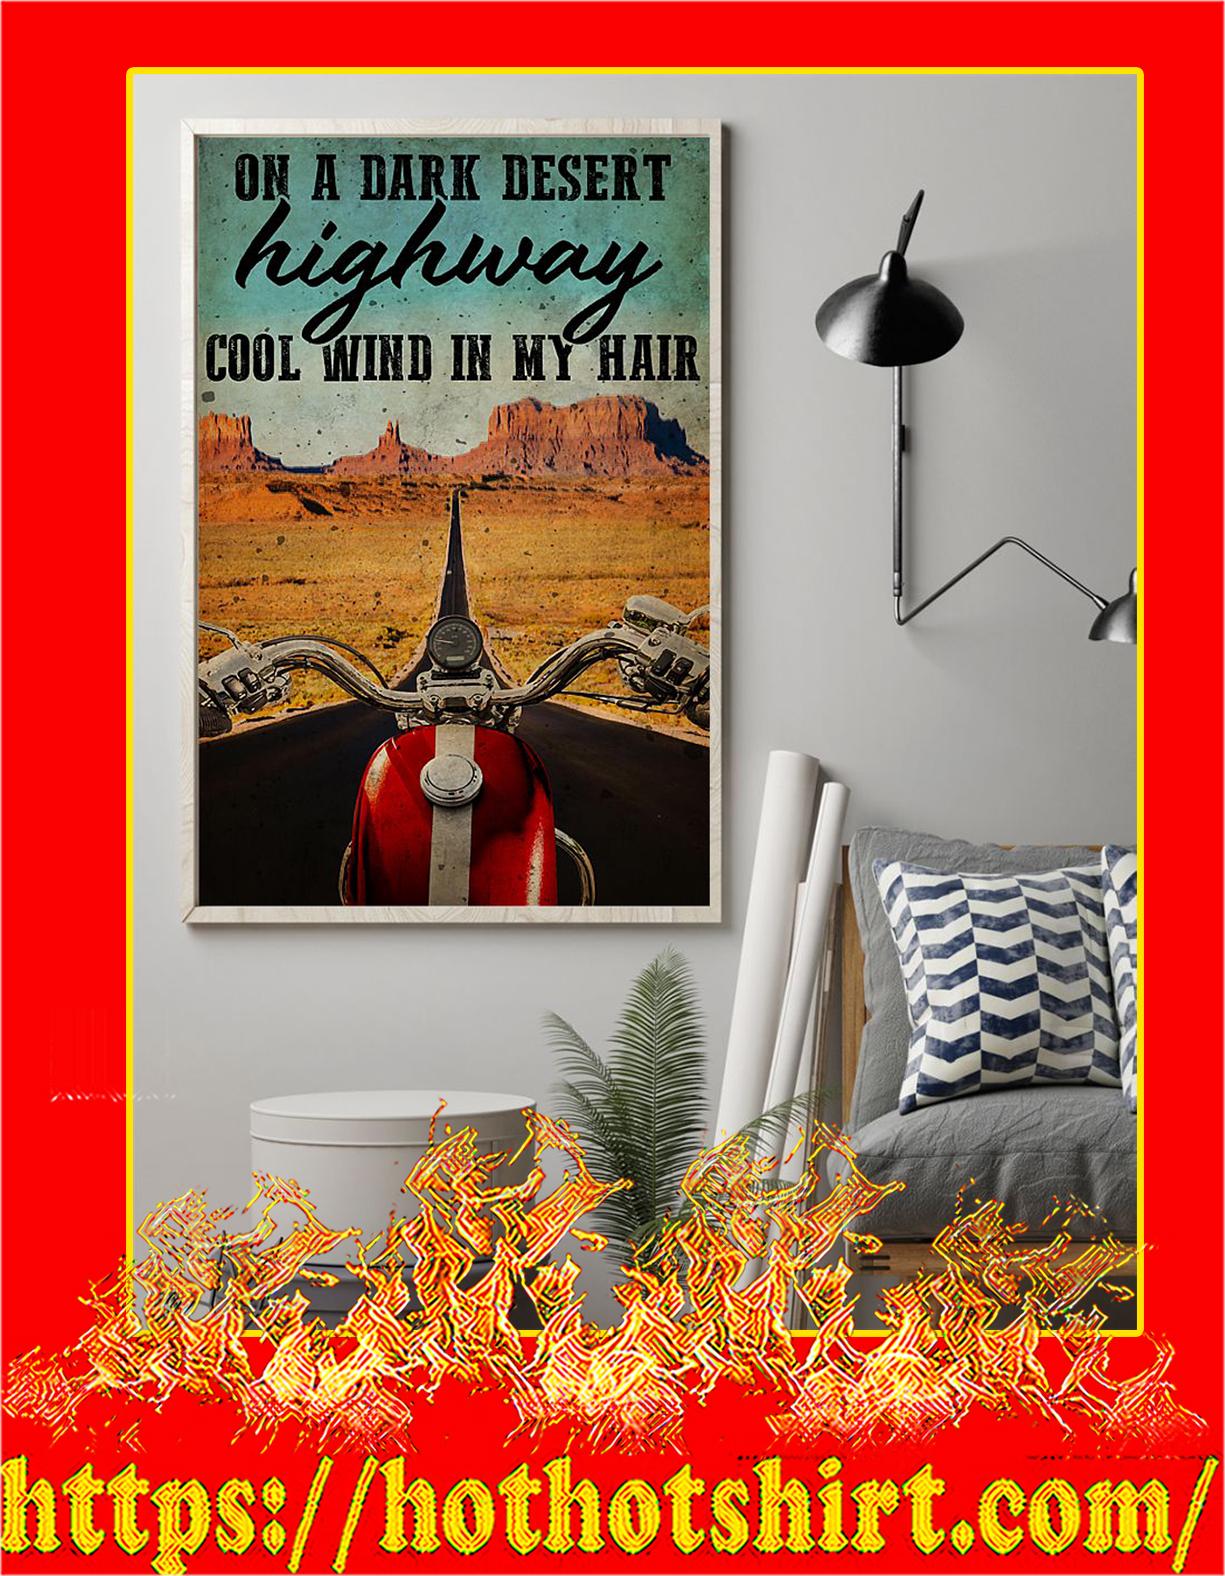 Biker On a dark desert highway cool wind in my hair poster - Pic 2